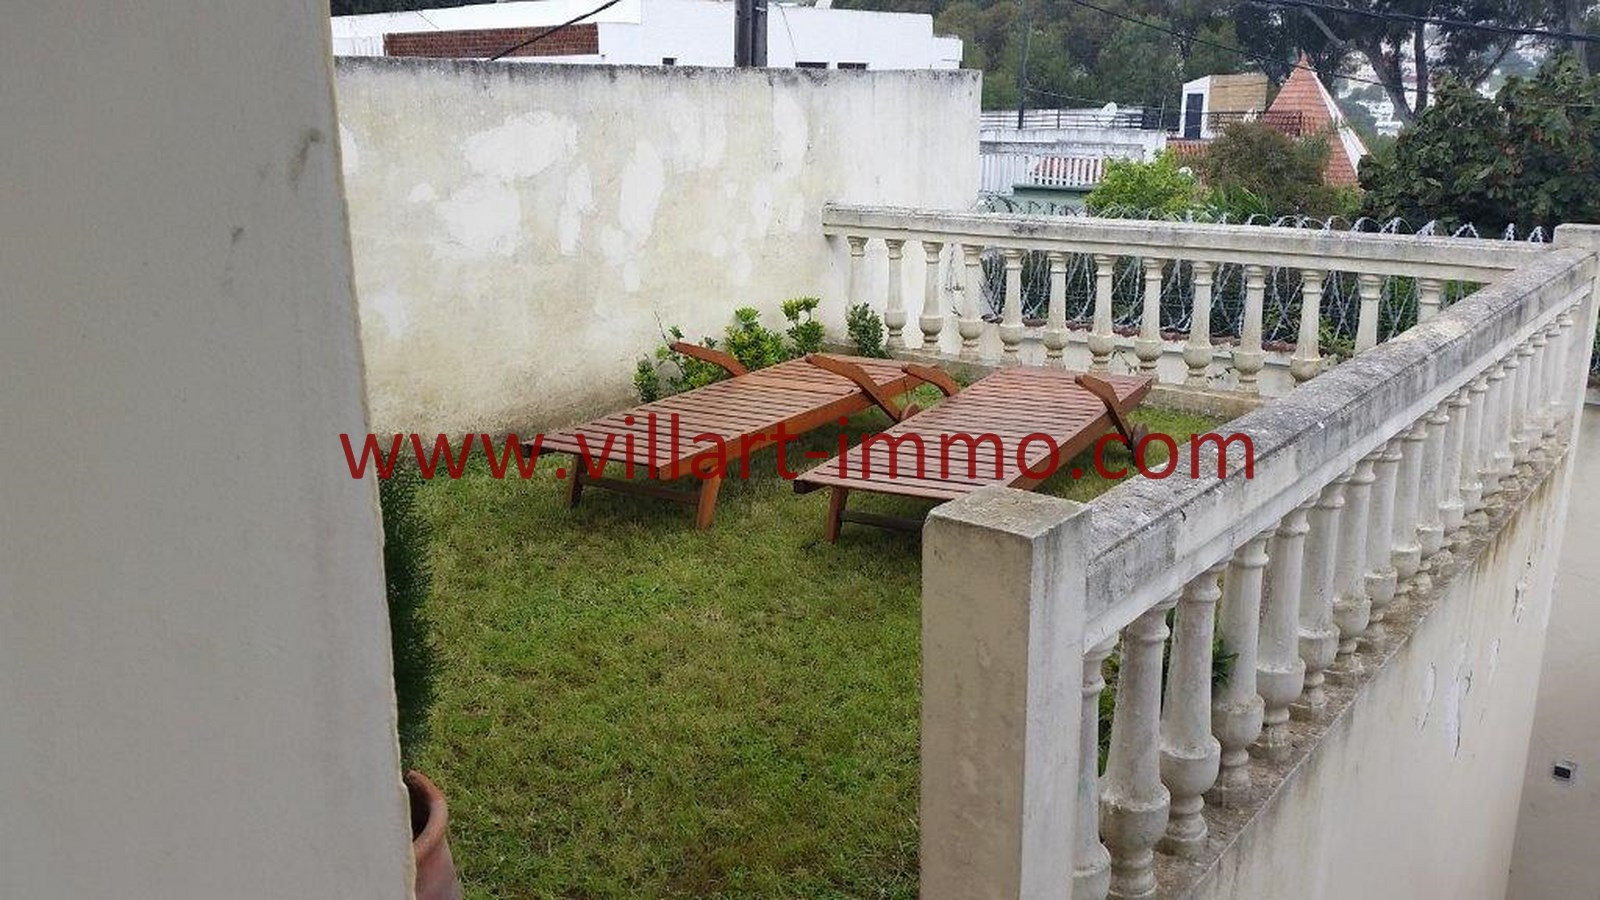 14-a-vendre-tanger-villa-californie-jardin-3-vv459-villart-immo-agence-immobiliere